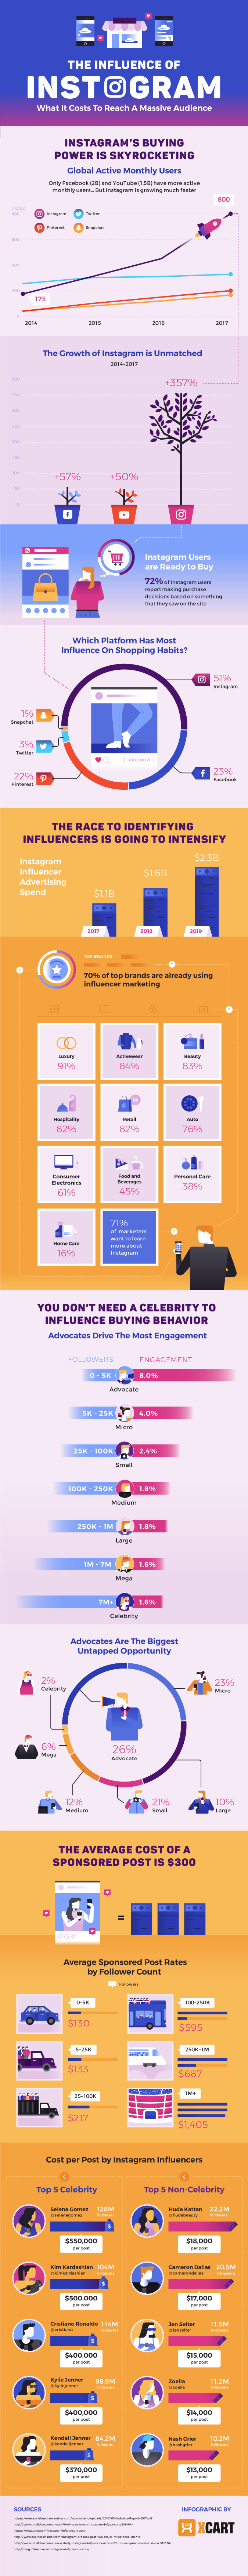 instagram marketing ecommerce